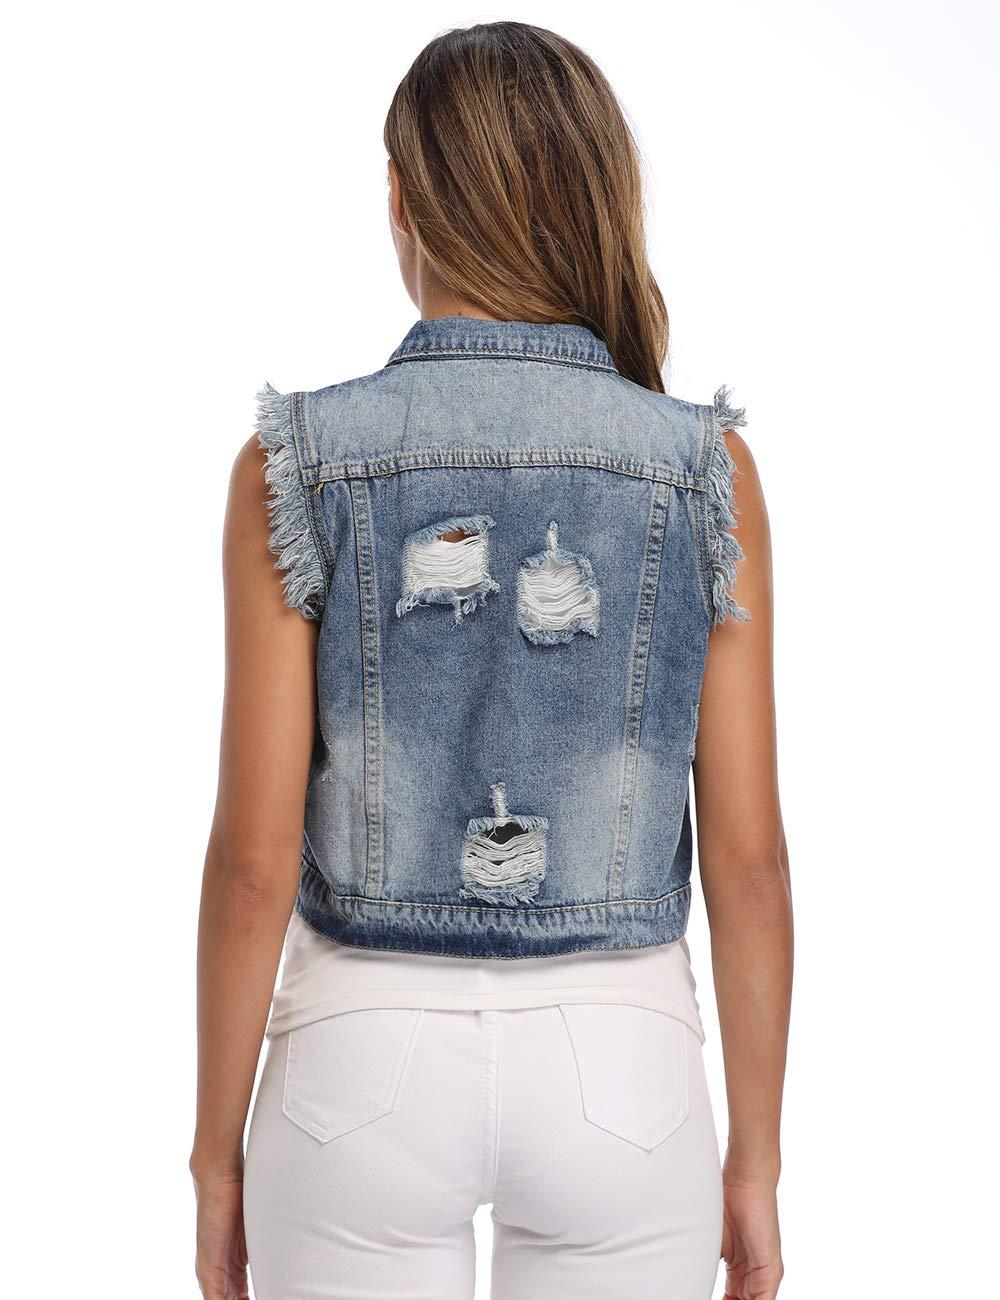 Peiqi Womens Jean Vest Cropped Denim Vest Sleeveless Denim Jacket Washed Denim Vest